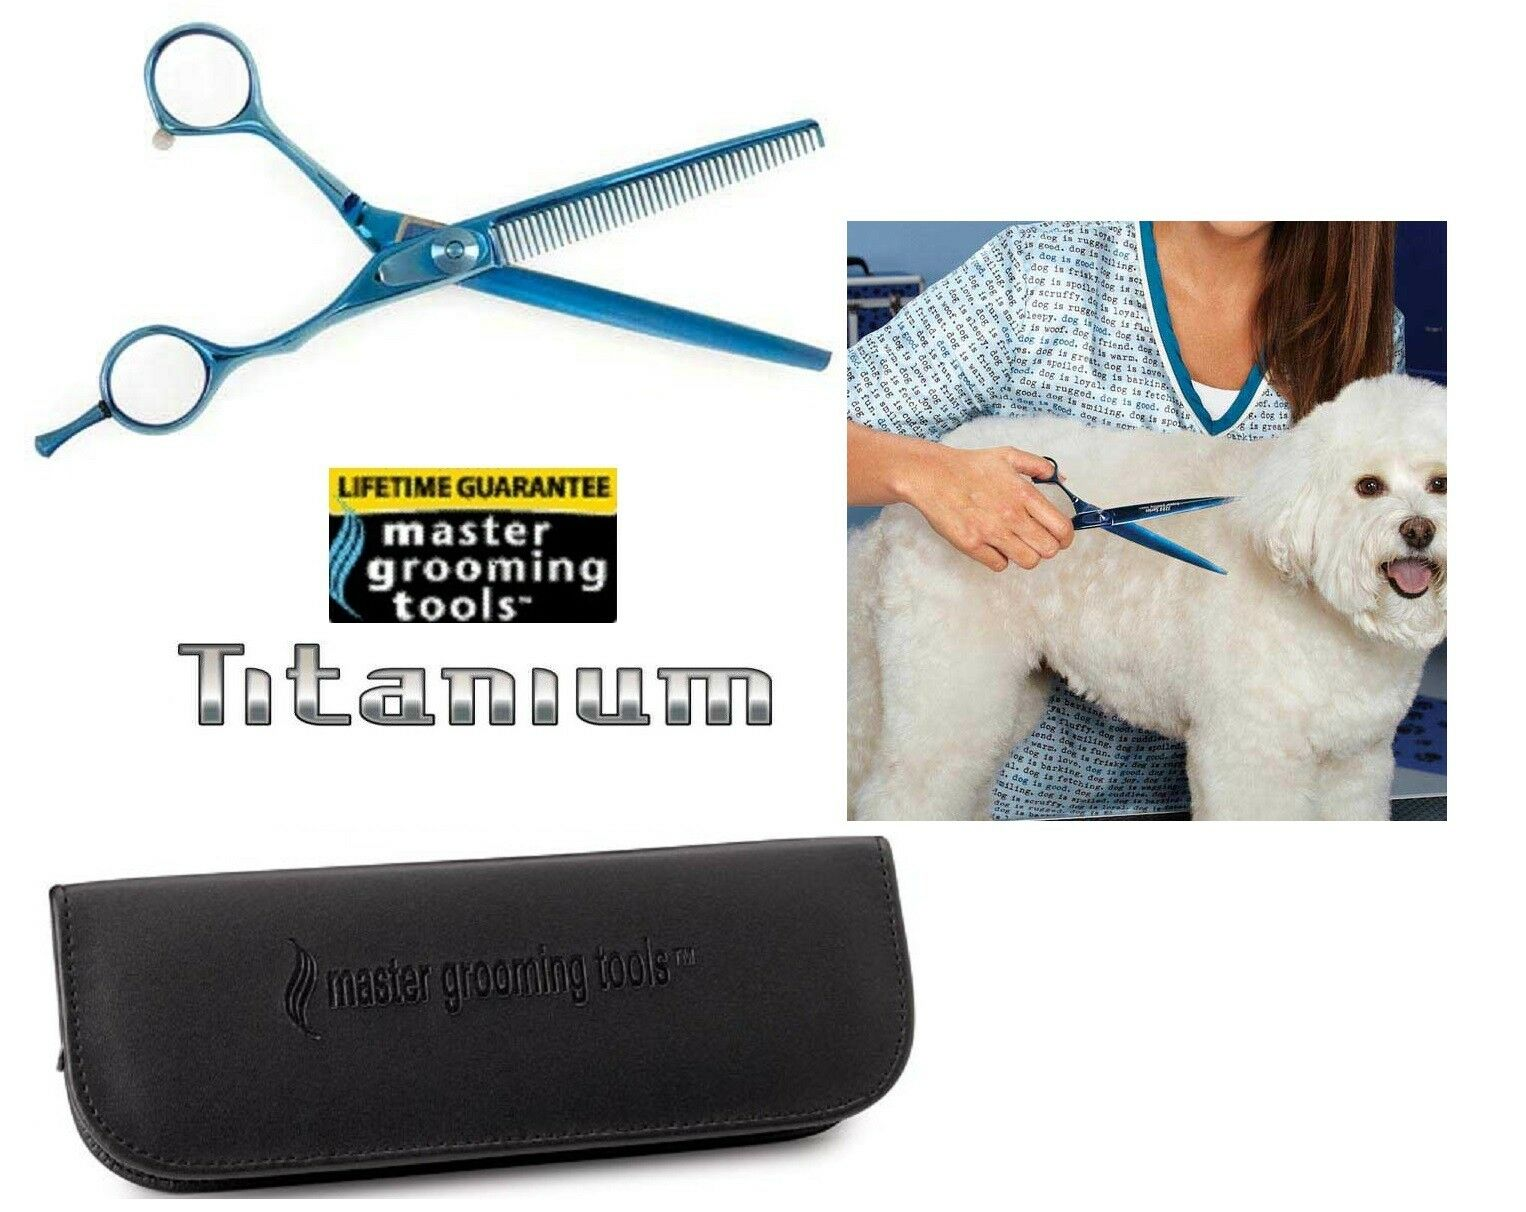 Master Grooming Tools TITANIUM 42 Tooth BLENDING bluee SHEAR SCISSOR Pet THINNING